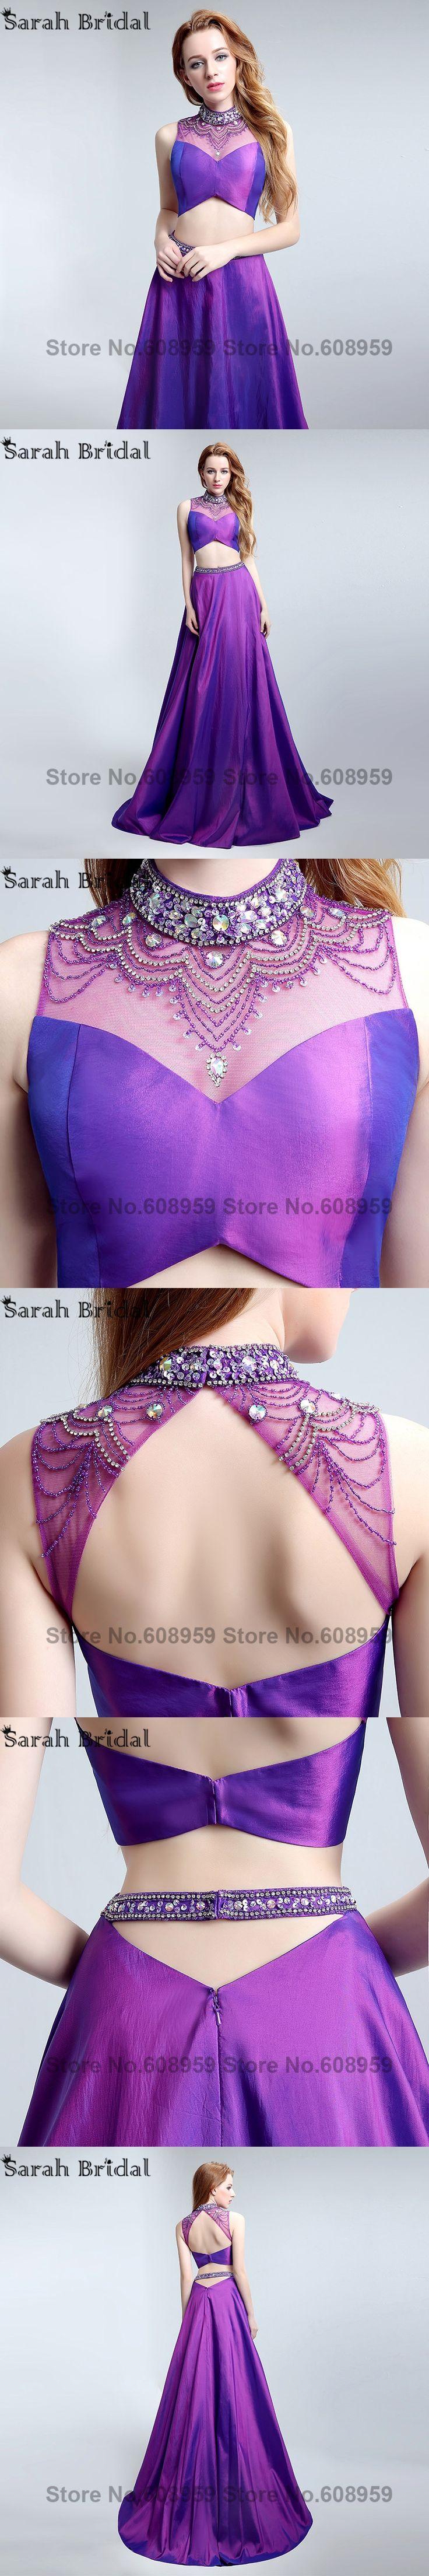 2017 Sheer High Neck Two Pieces Prom Dresses Purple Cut Back Taffeta Formal Dress Party Crystal Beads Vestidos De Noche LSX149